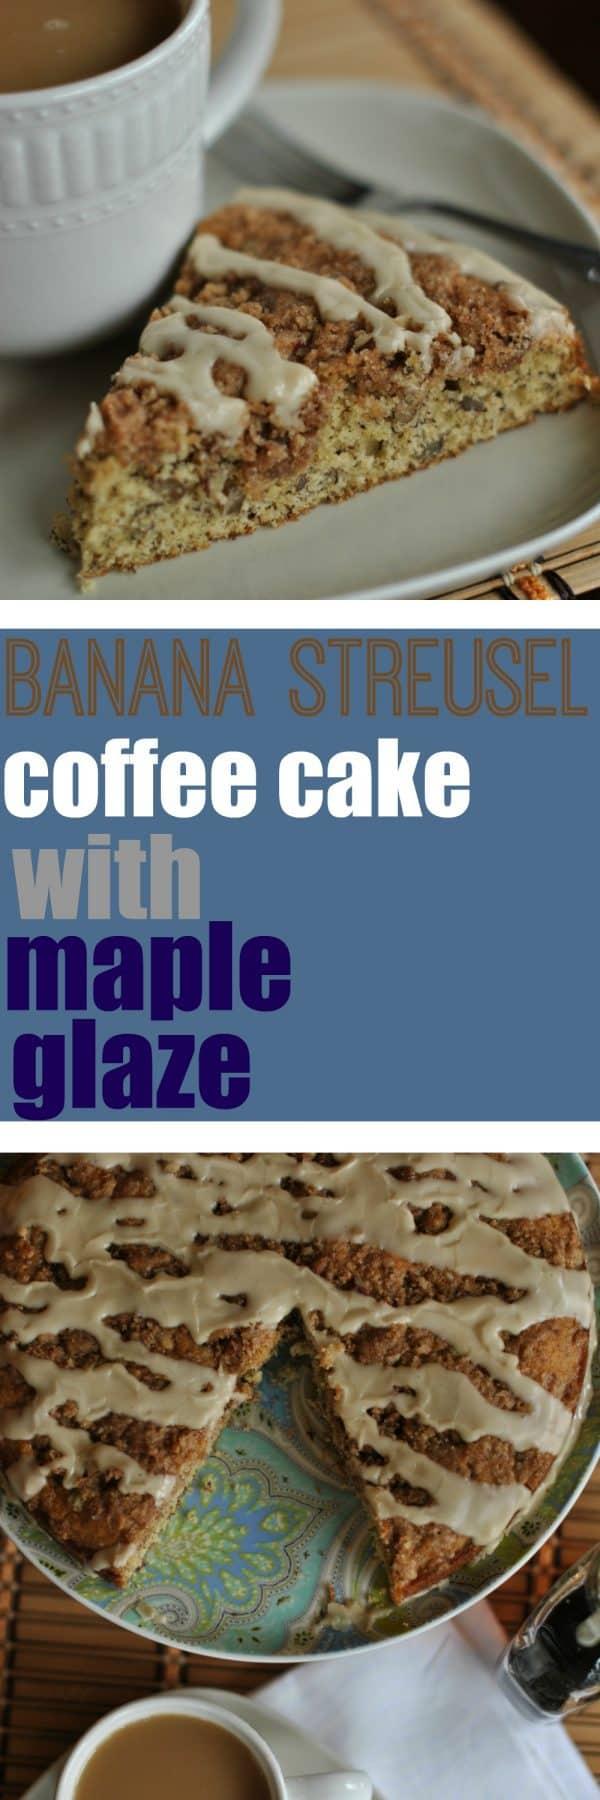 Banana Streusel Coffee Cake with Maple Glaze